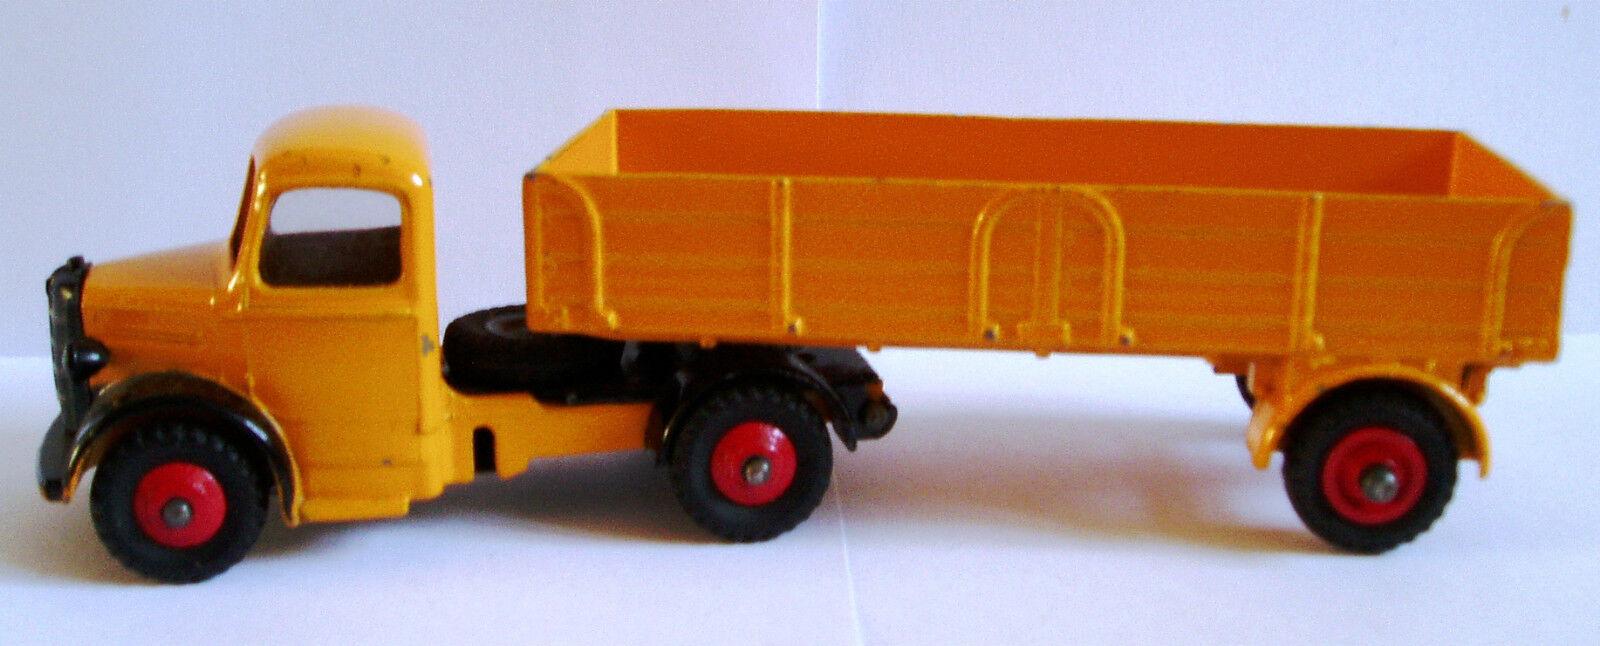 Dinky 409 Bedford Near Mint Diecast Articulated Lorry in Near Mint Original Box